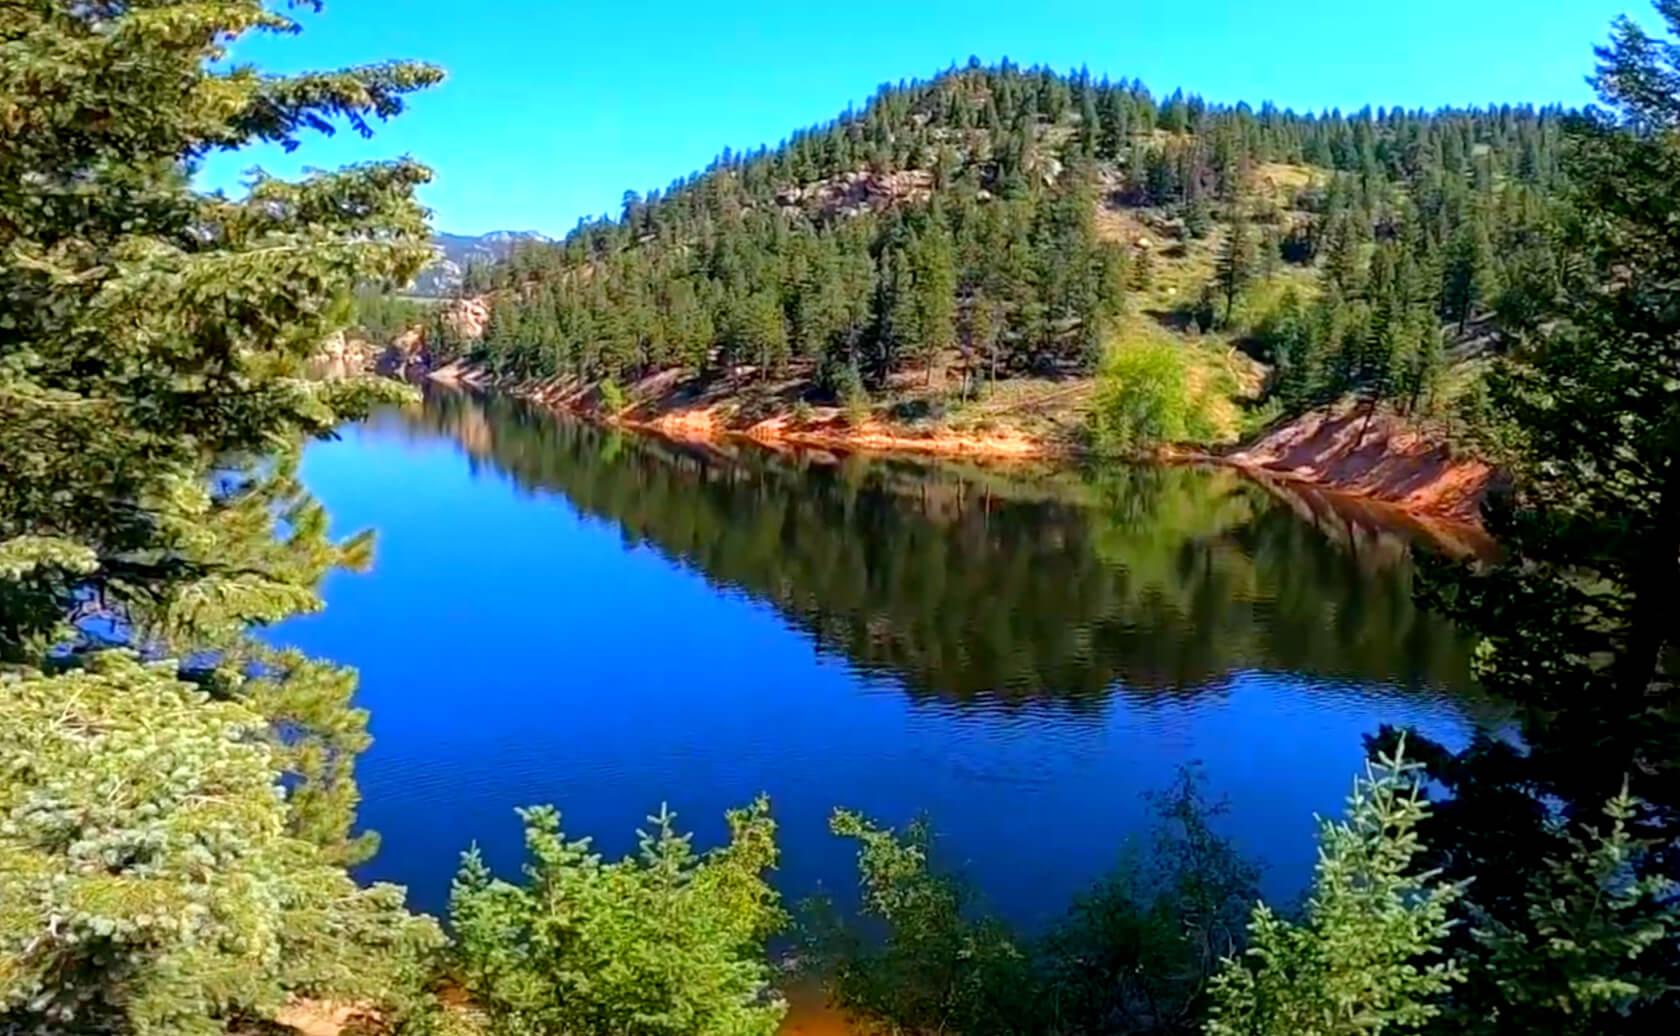 Gross-Lake-Fishing-Guide-Report-Colorado-07